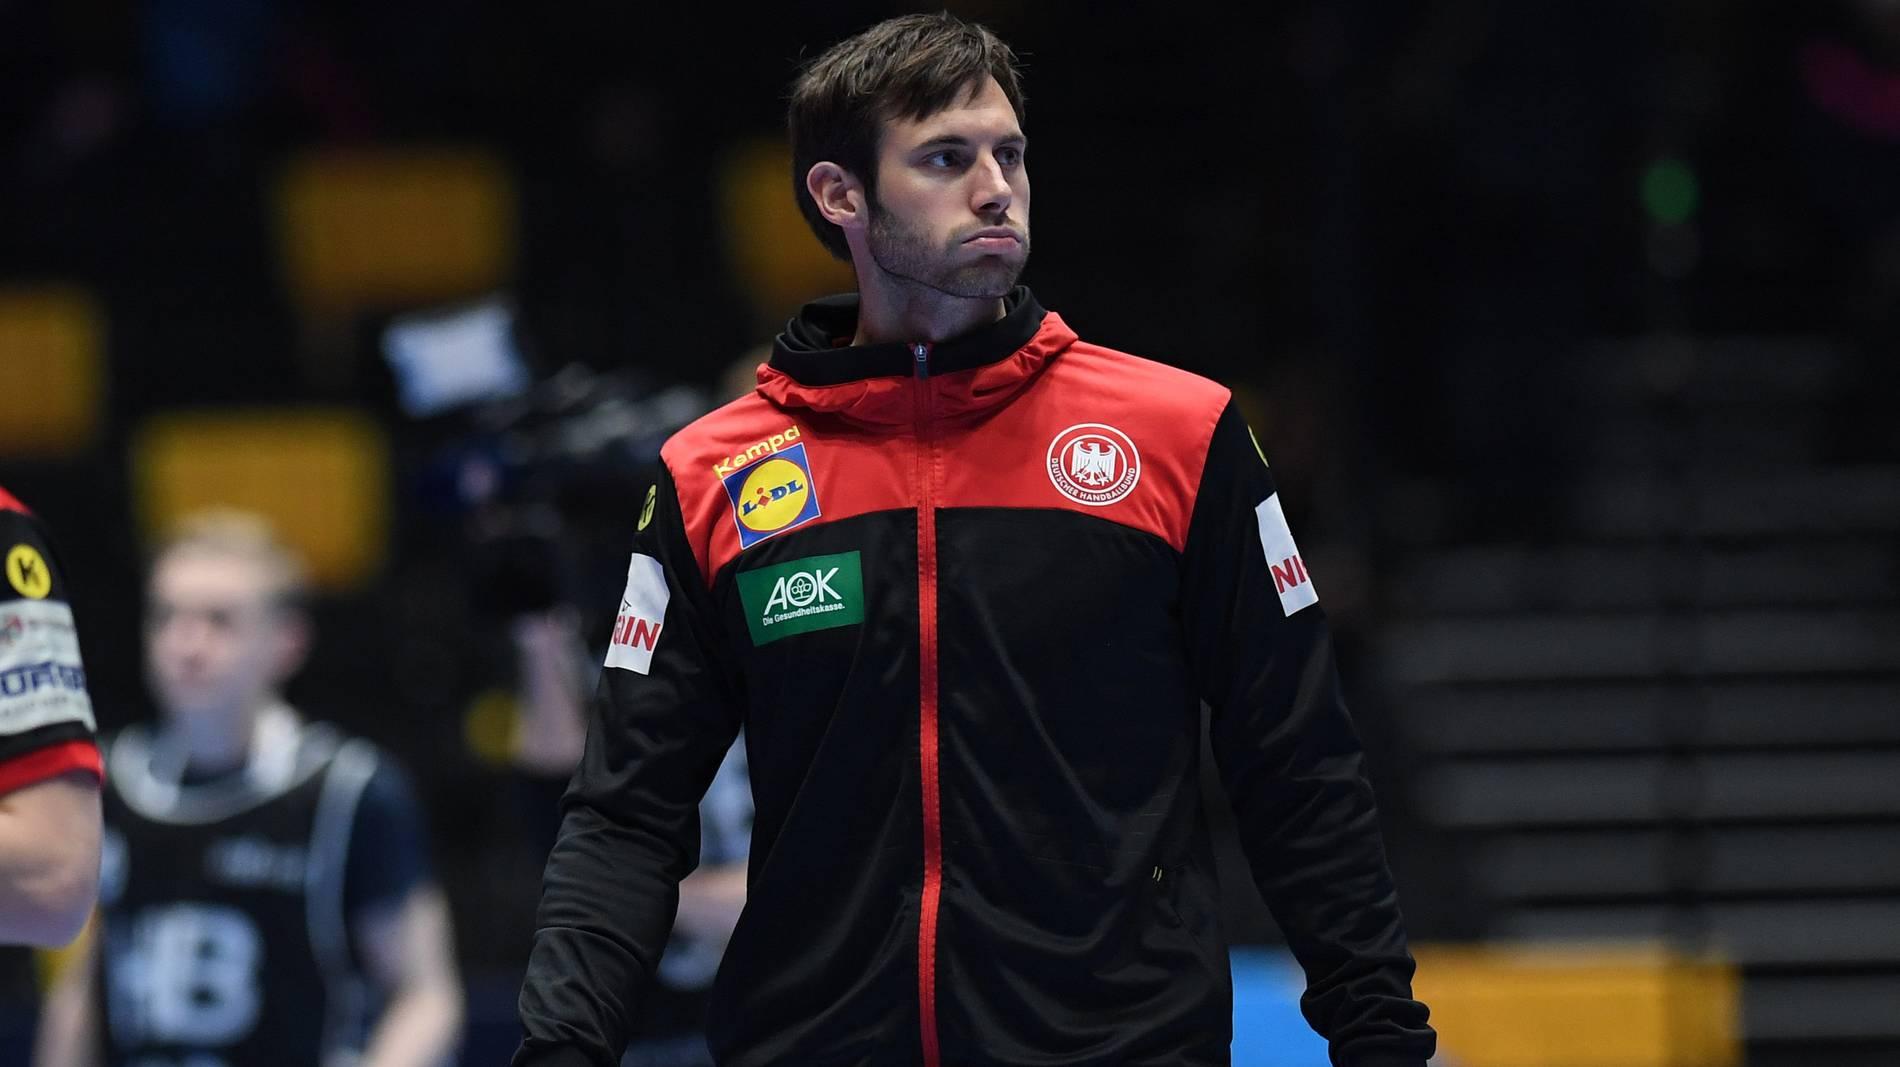 Handball Em 2020 Bundestrainer Christian Prokop Verteidigt